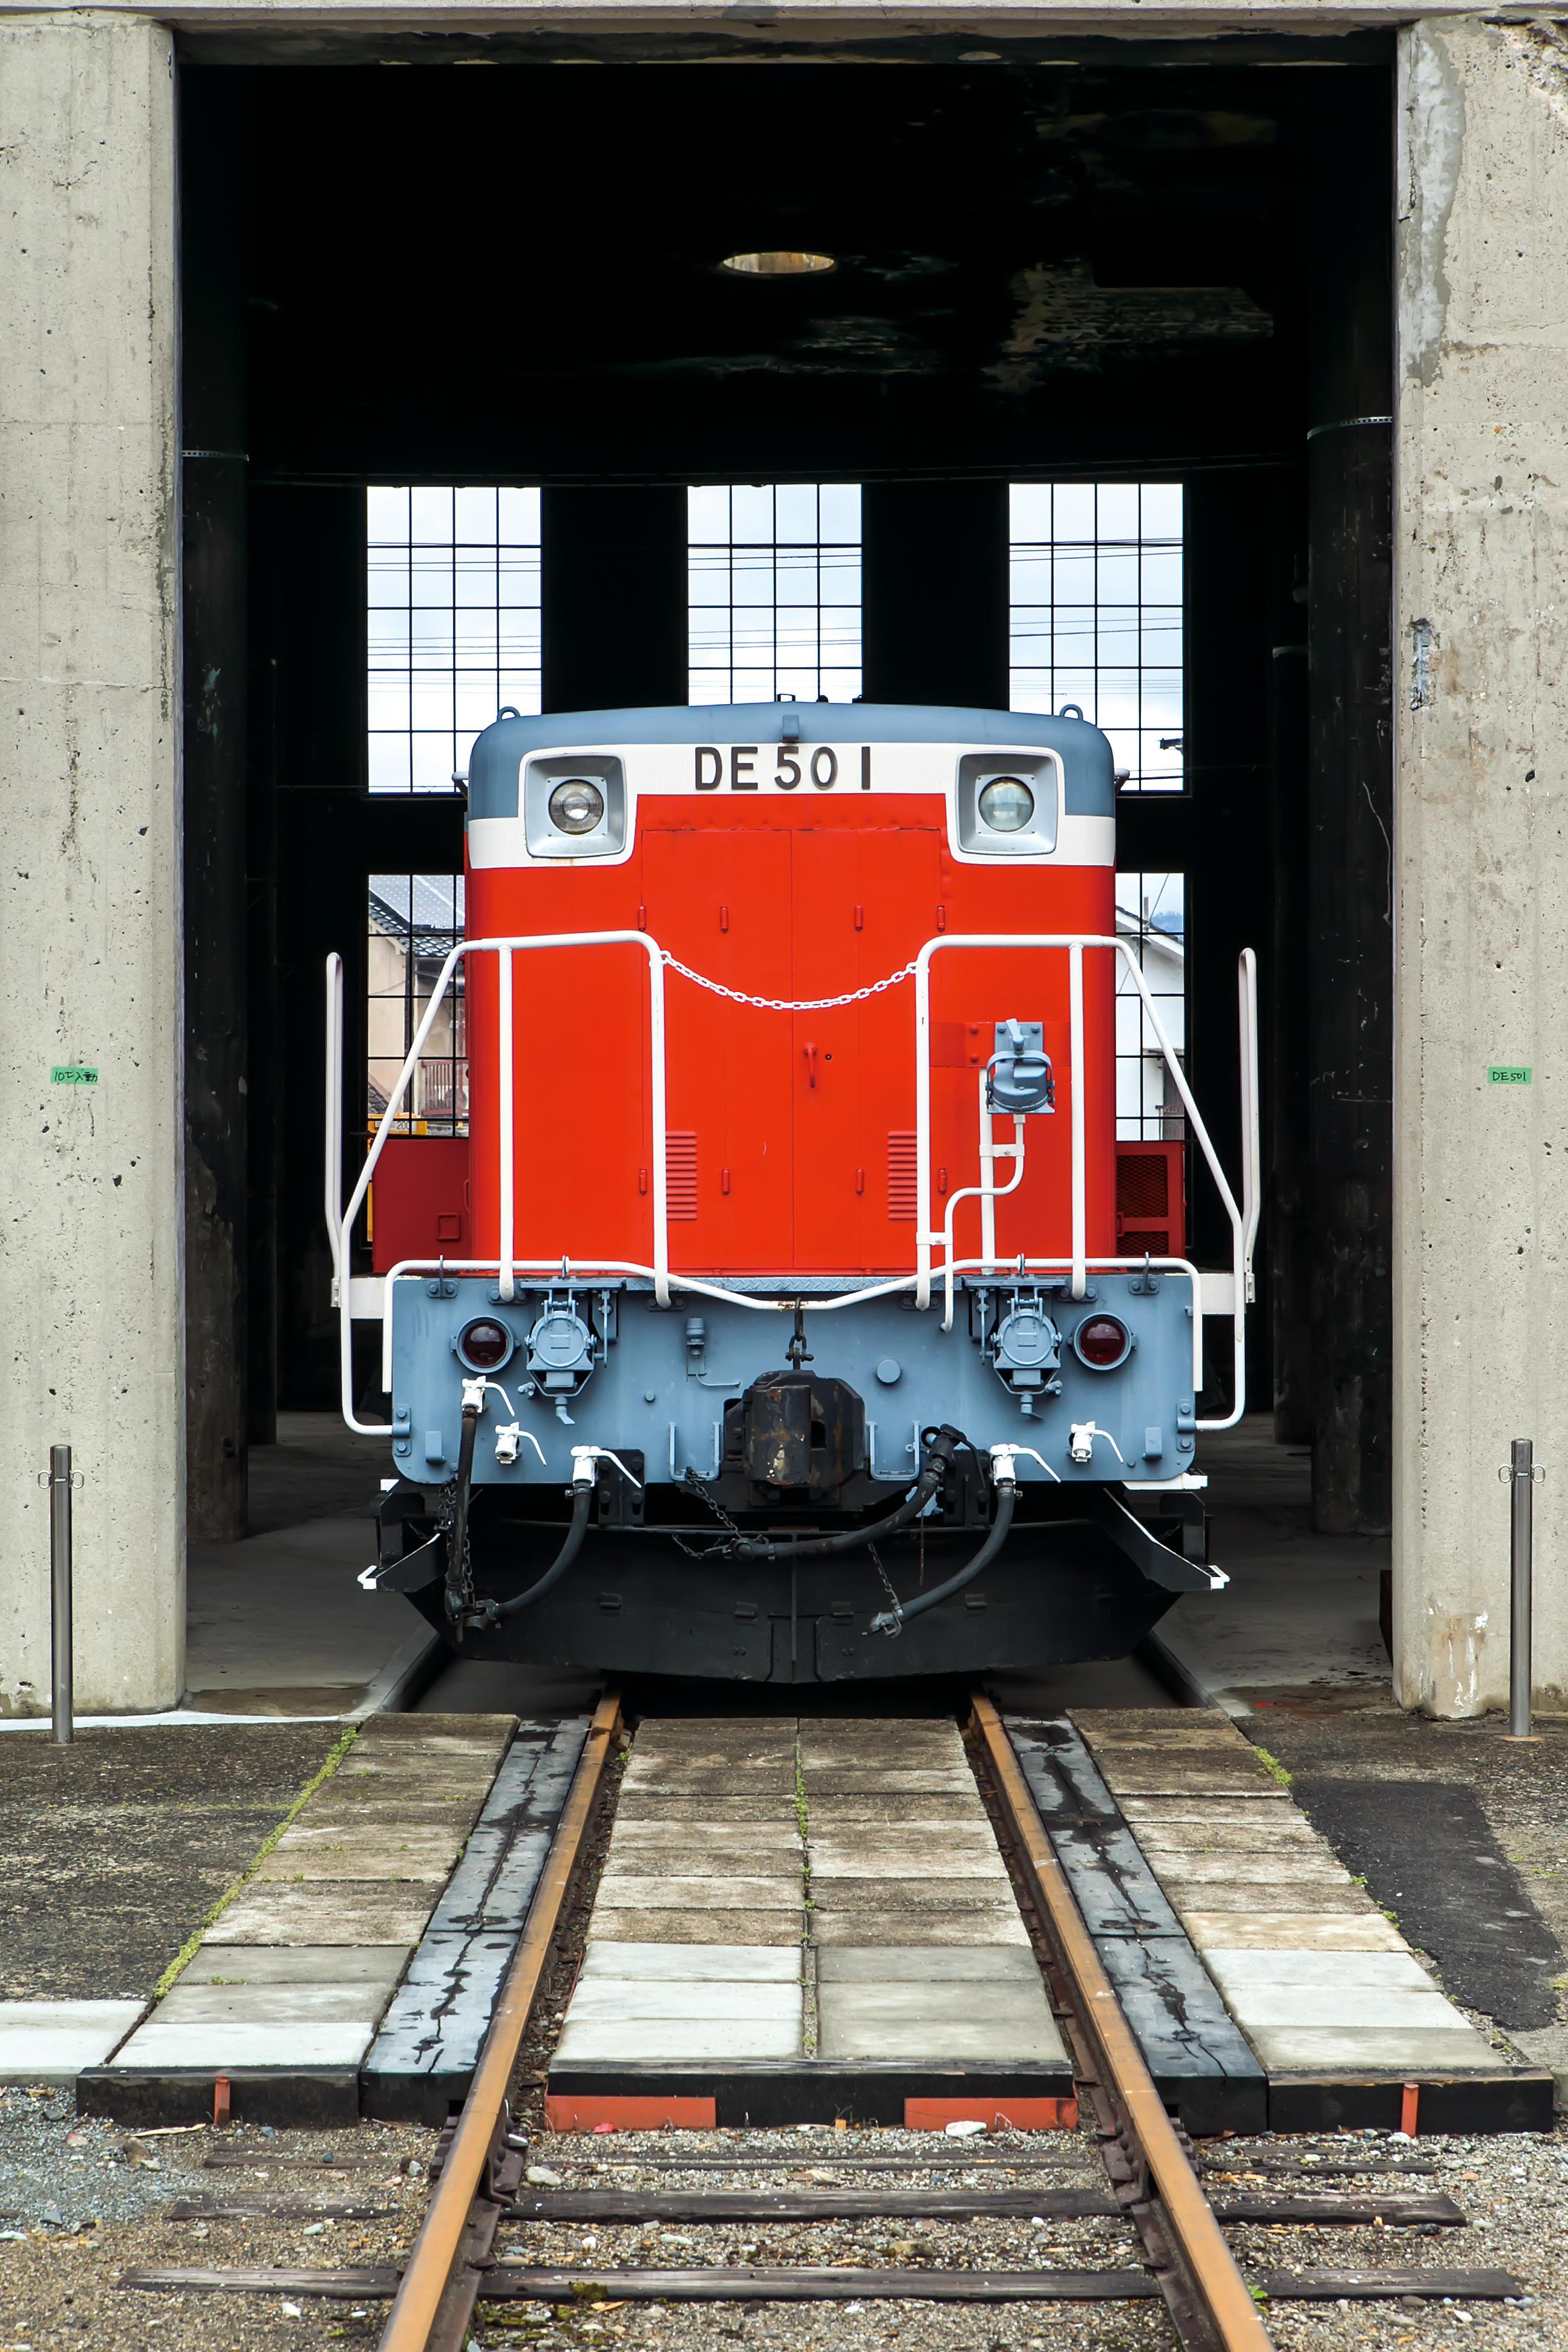 DE50形ディーゼル機関車.jpg